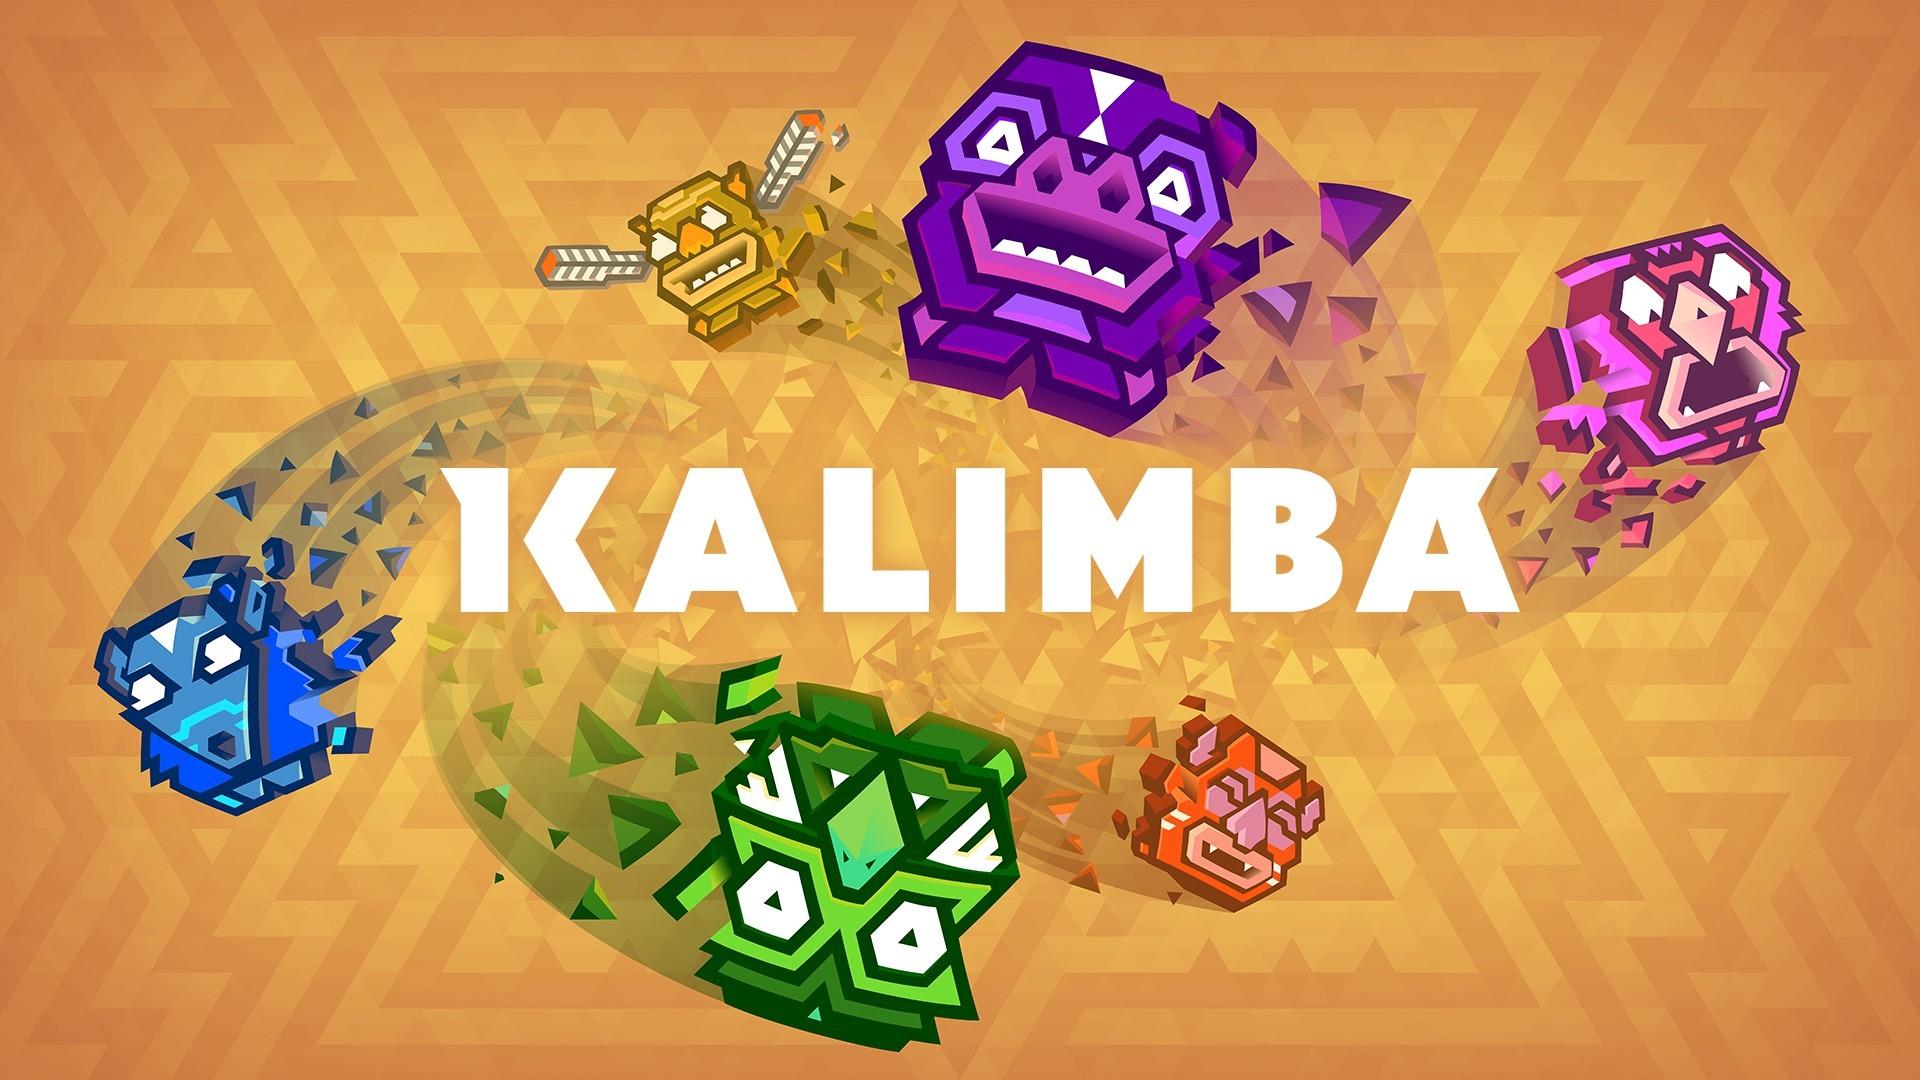 Kalimba 271015 1